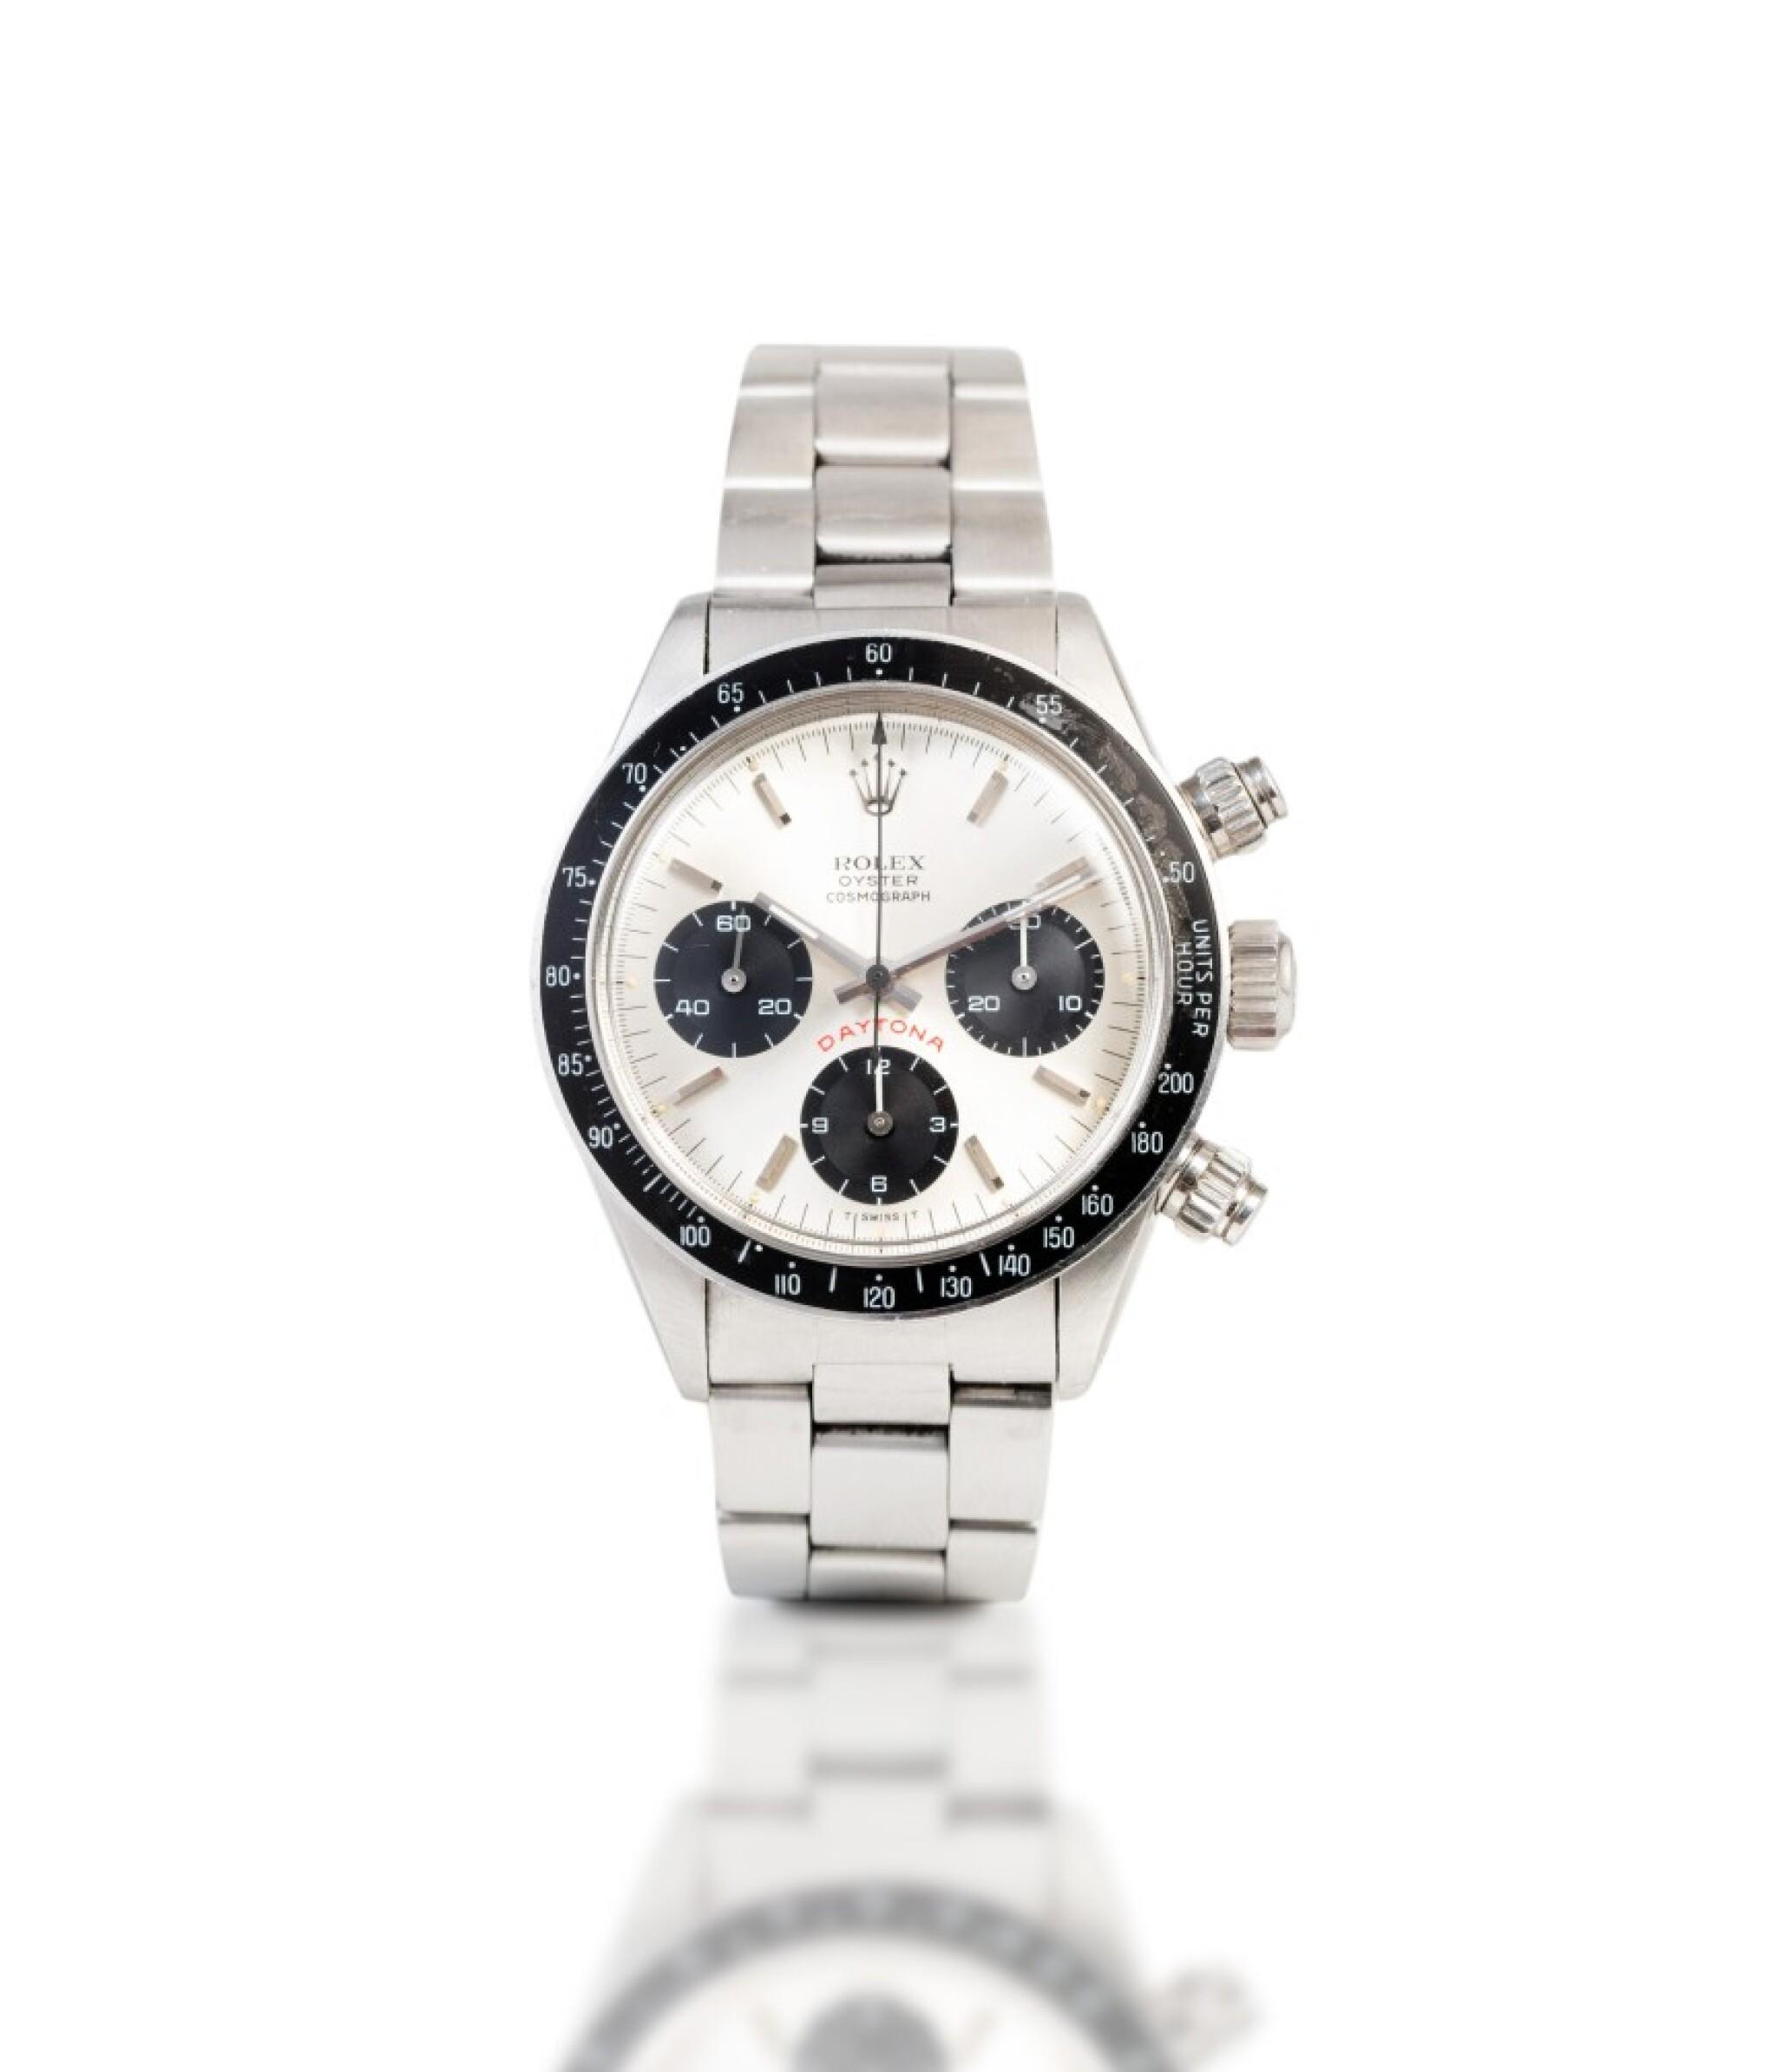 View full screen - View 1 of Lot 21. Daytona, Ref. 6263    Chronograph bracelet en acier avec bracelet |  Stainless steel chronograph wristwatch with bracelet    Vers 1978 |  Circa 1978.